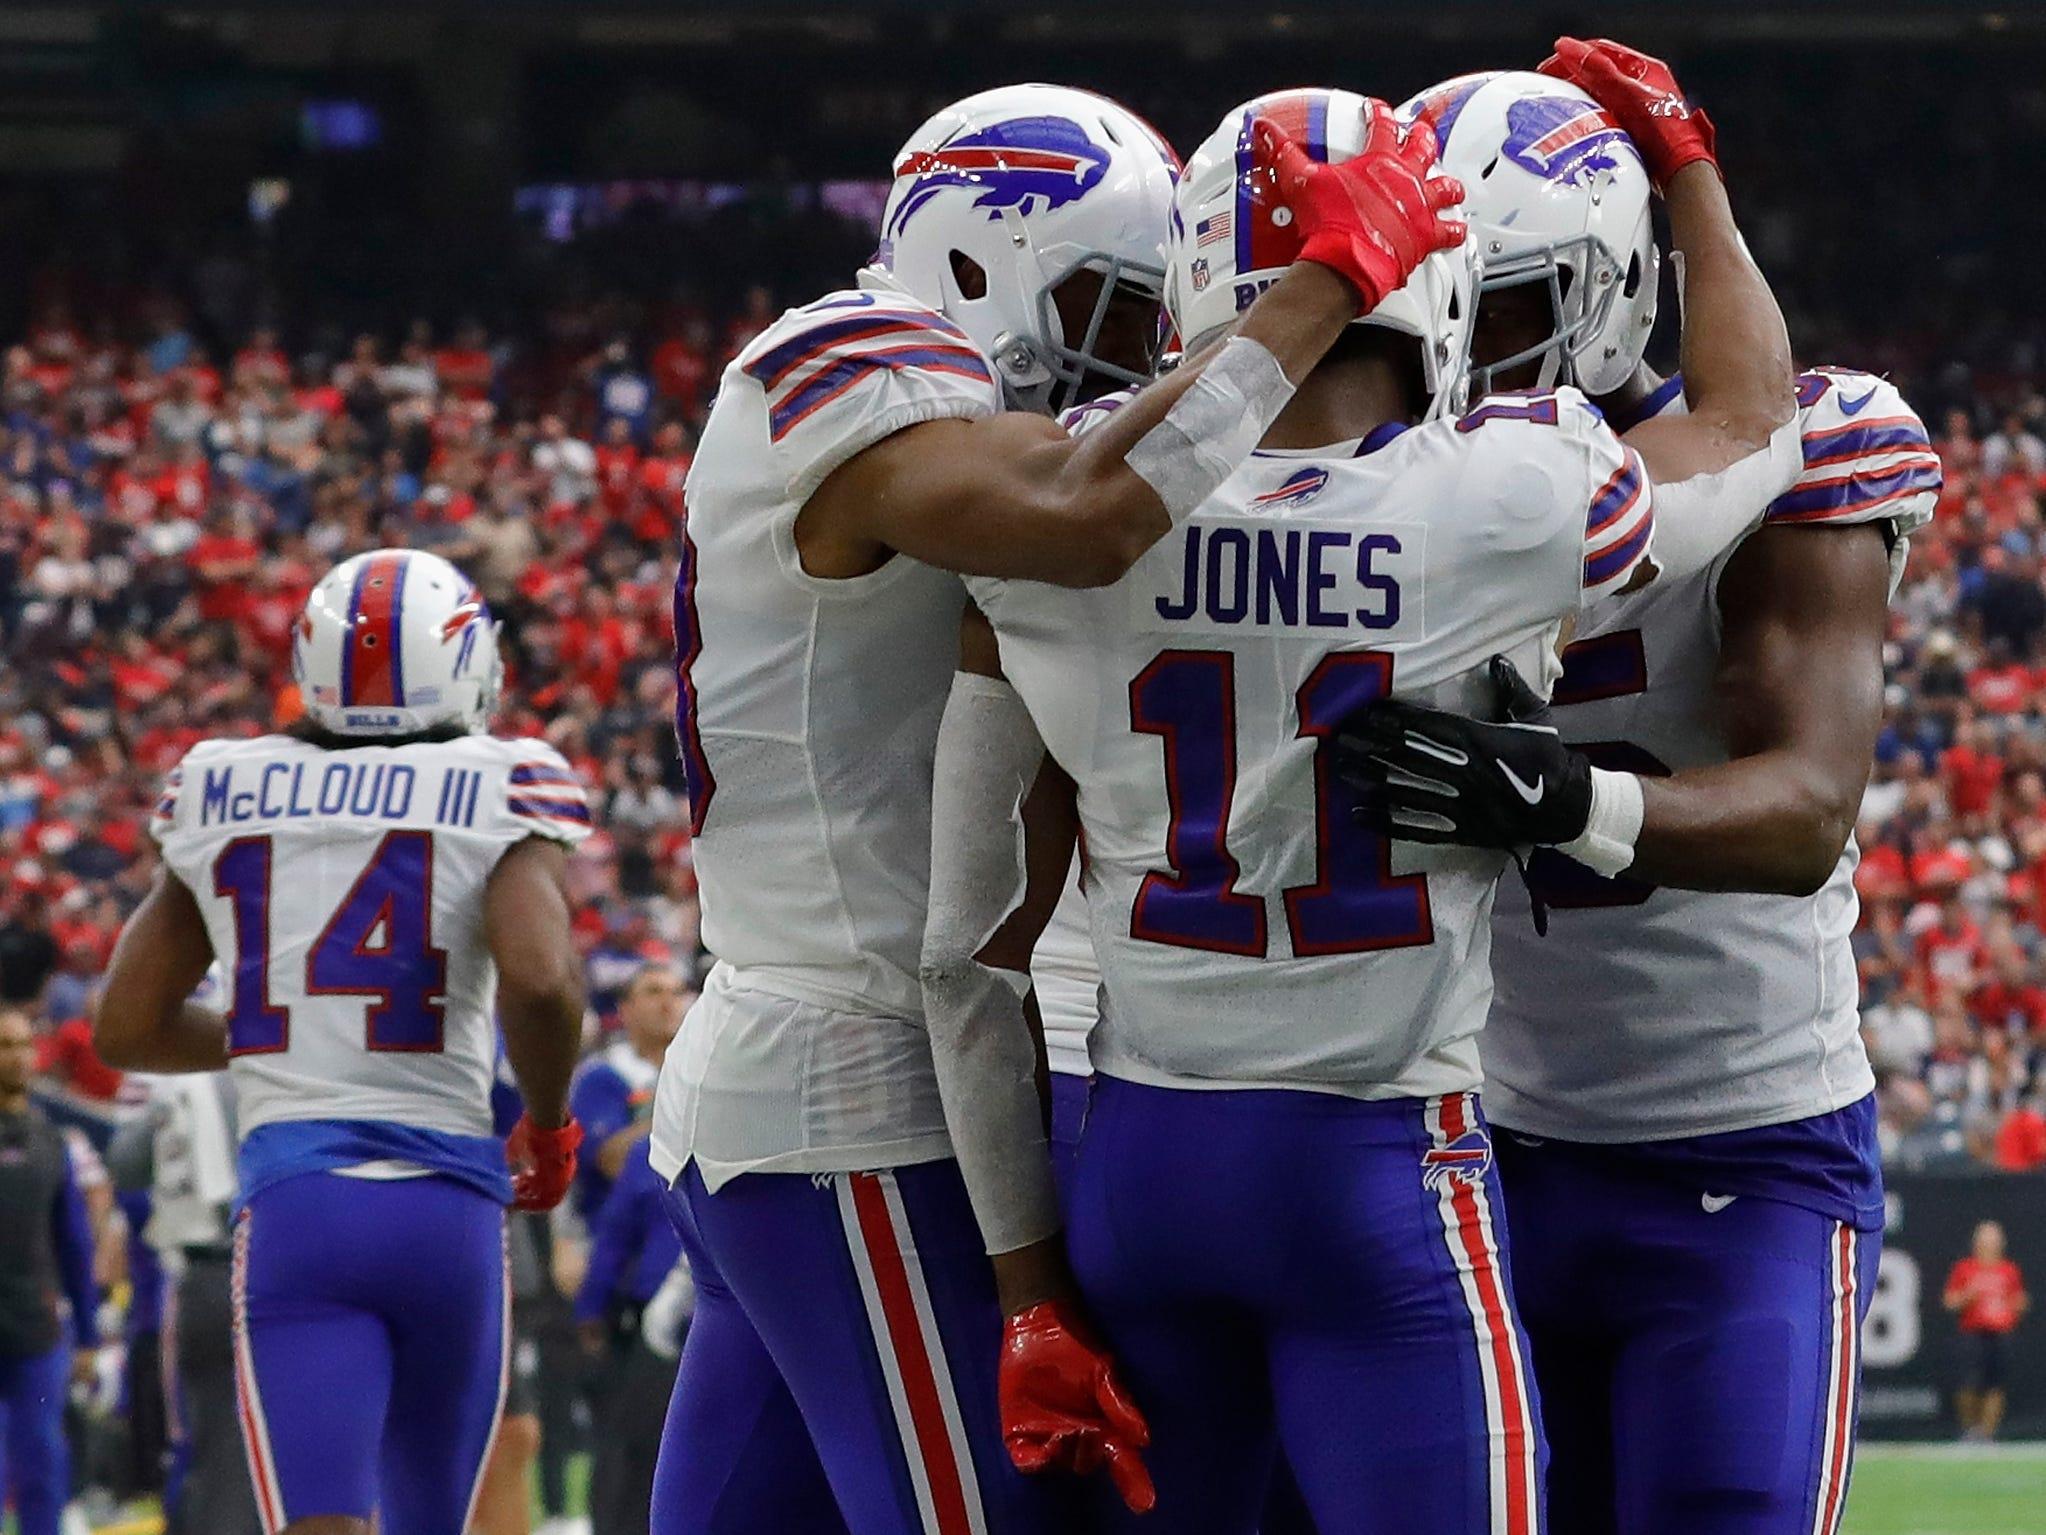 Zay Jones of the Buffalo Bills celebrates a touchdown catch against Houston on Oct. 14.